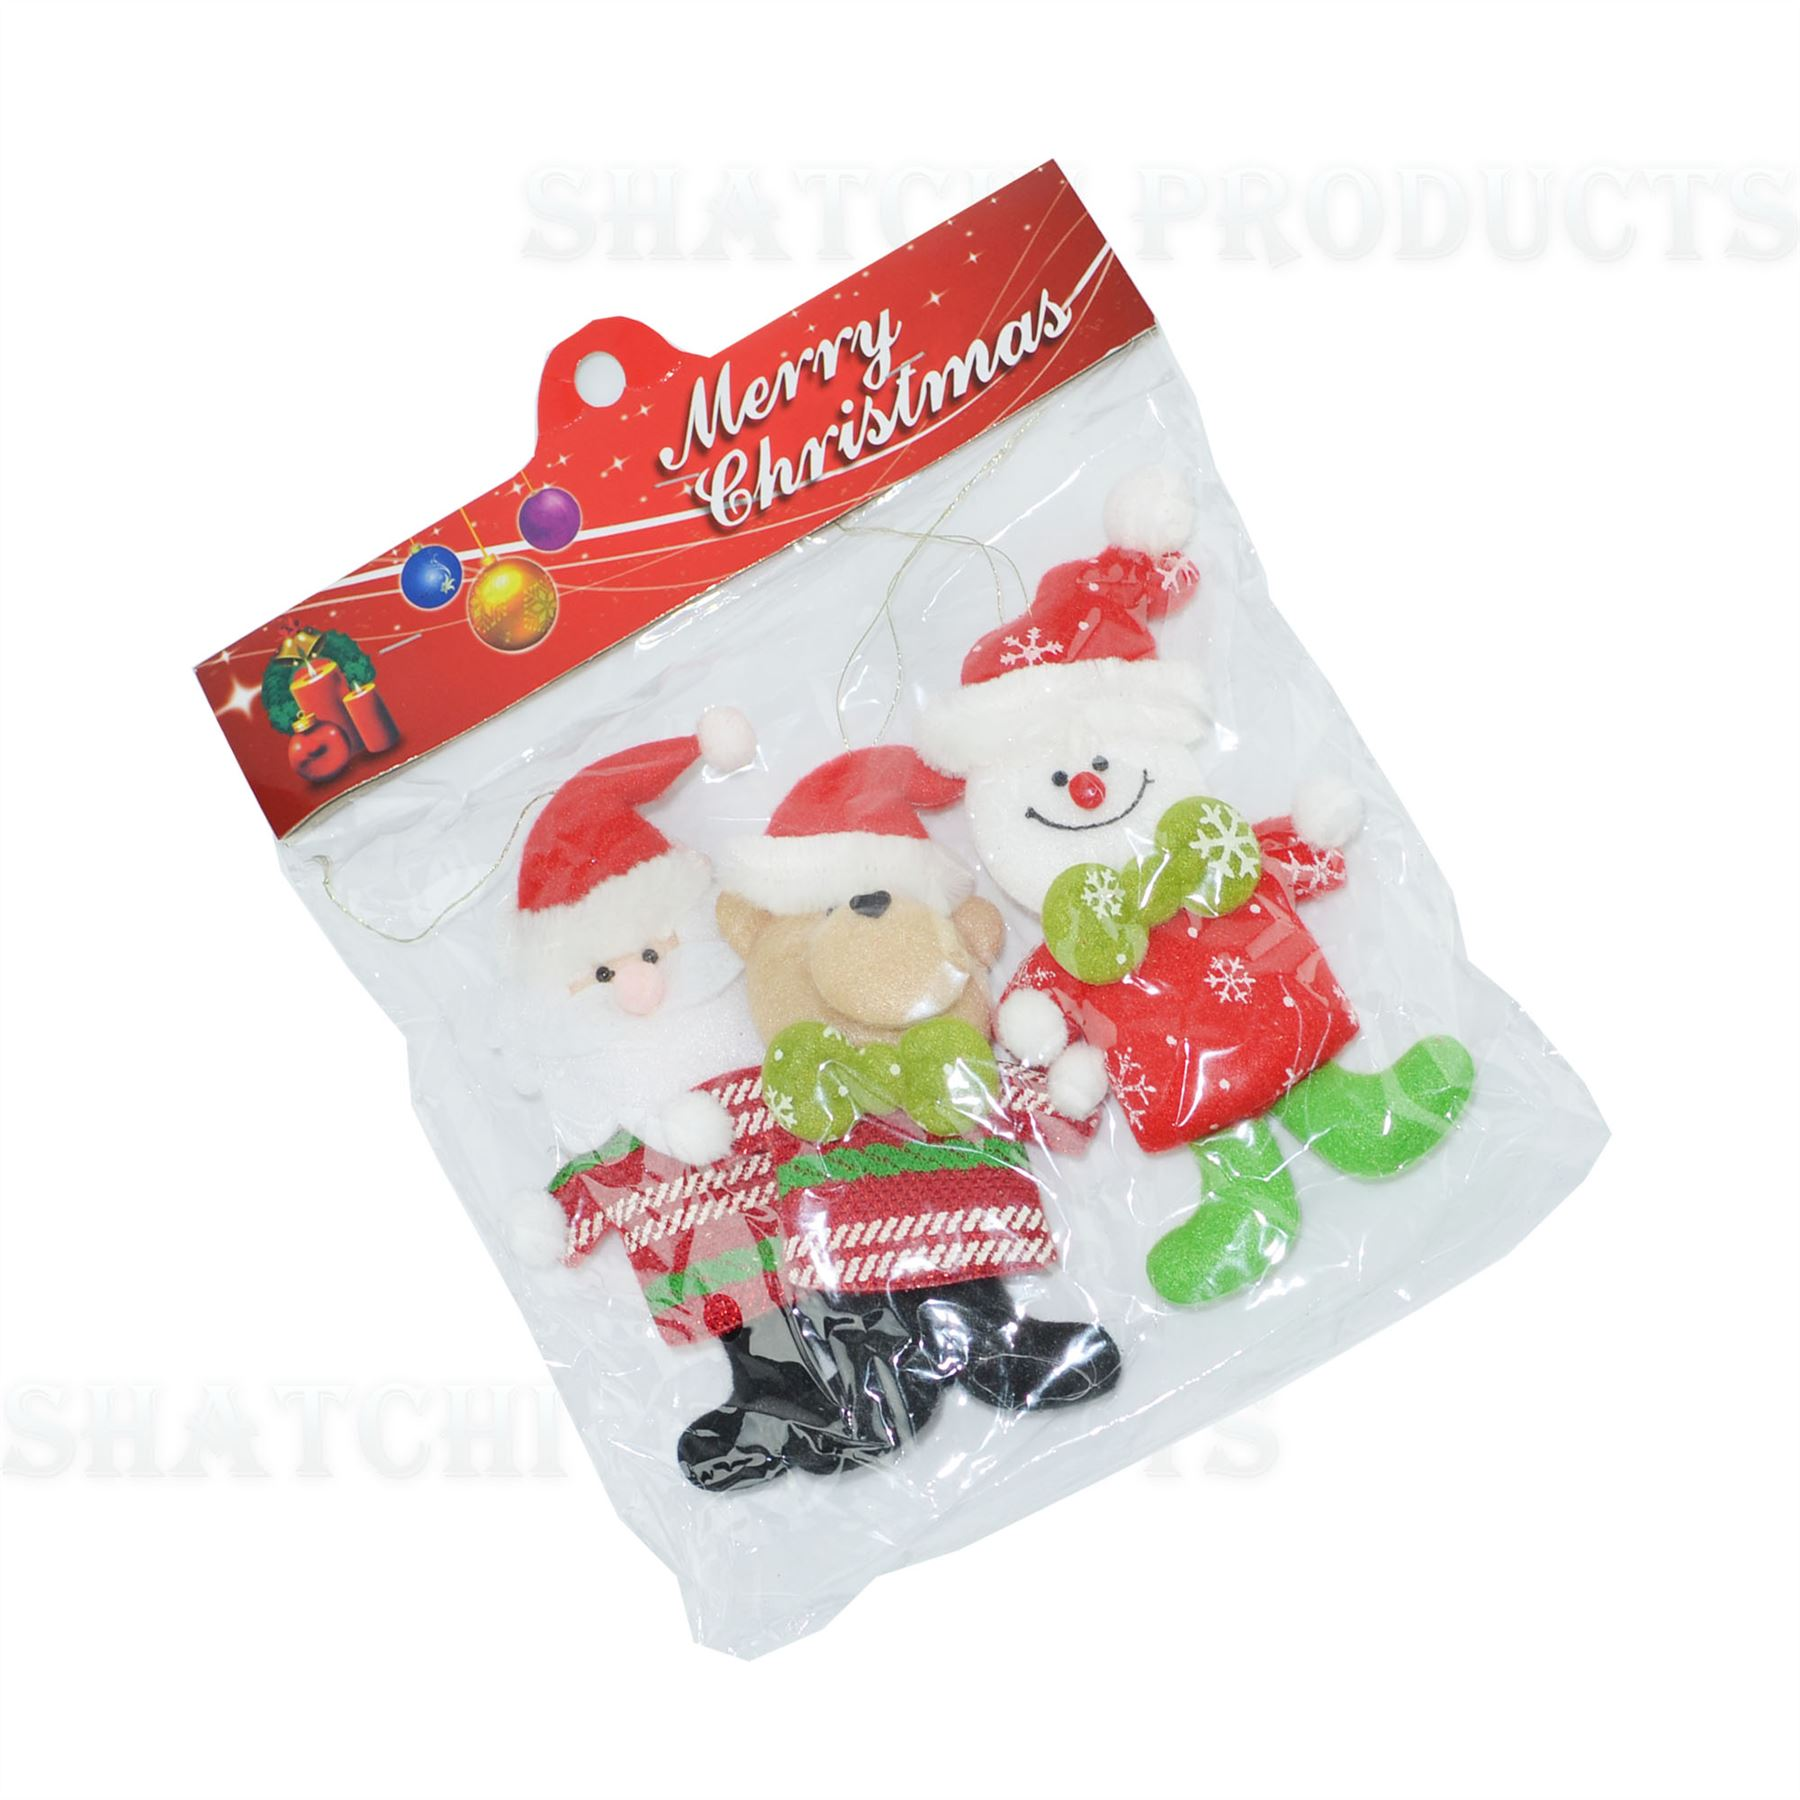 Christmas-Tree-Hanging-Decorations-Glitter-Snowman-Xmas-Beads-Chain-Garland thumbnail 18